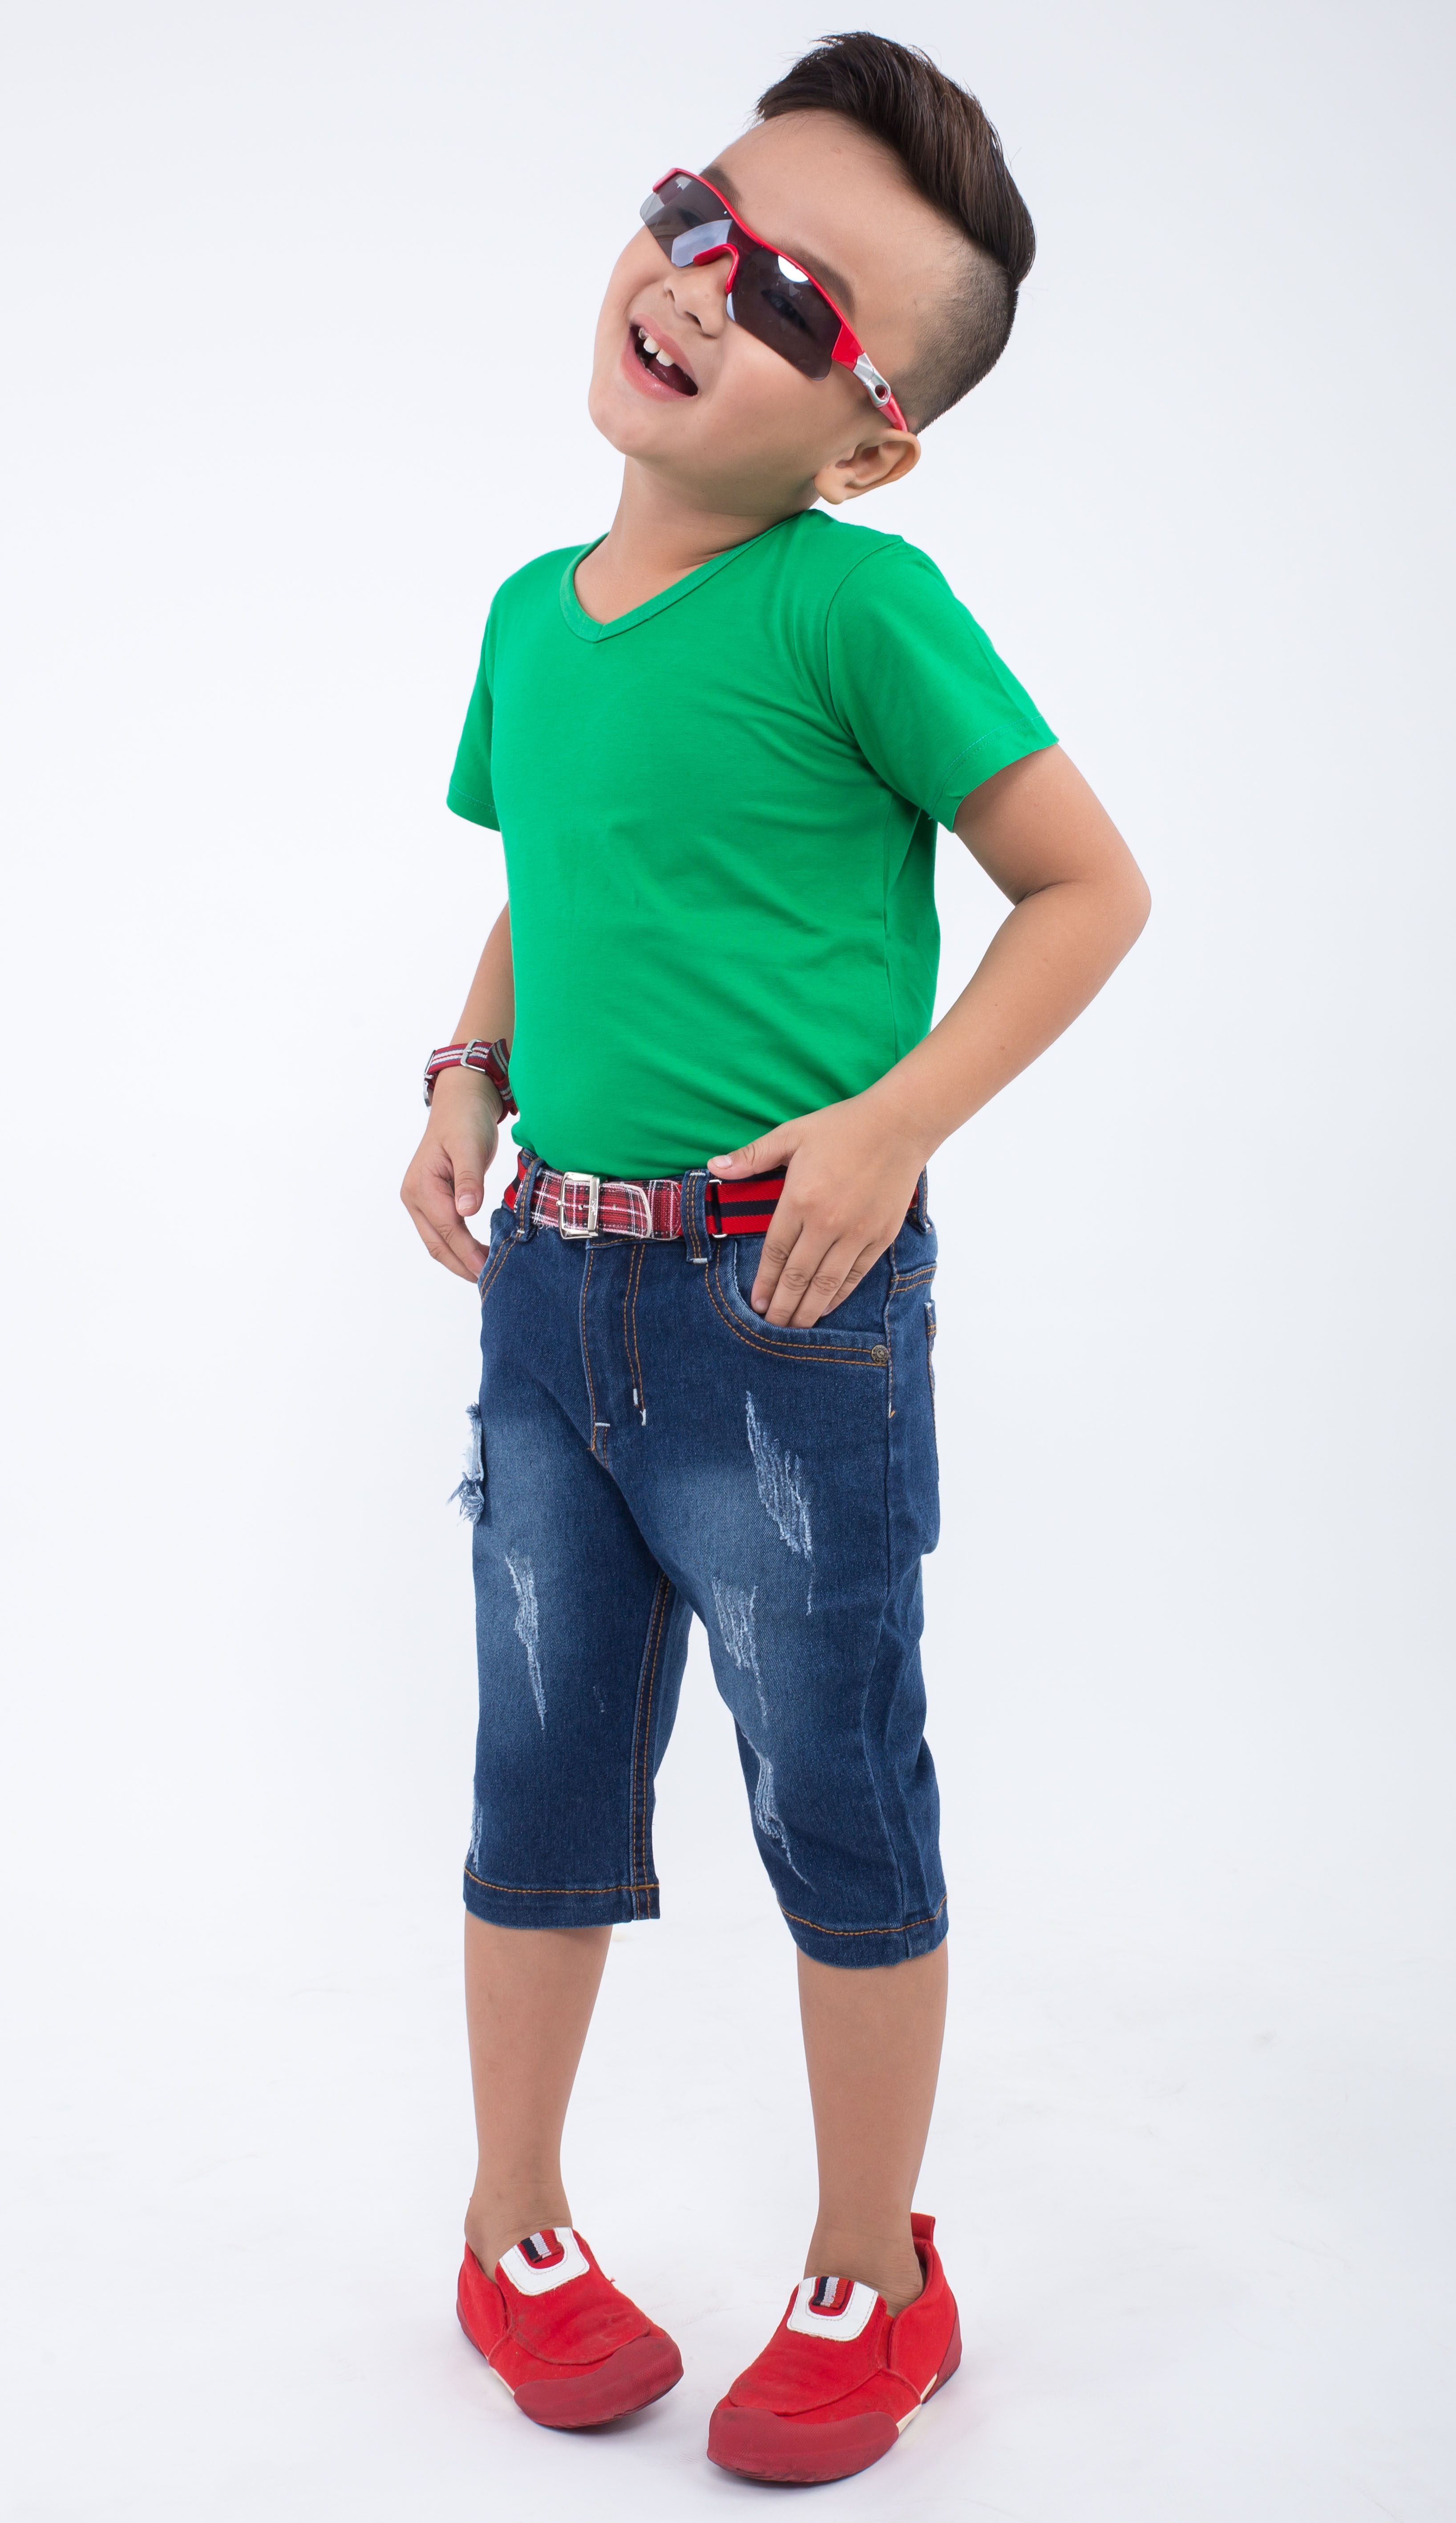 Quần jeans lửng bé trai Ugether UKID158 (Xanh jeans đậm)